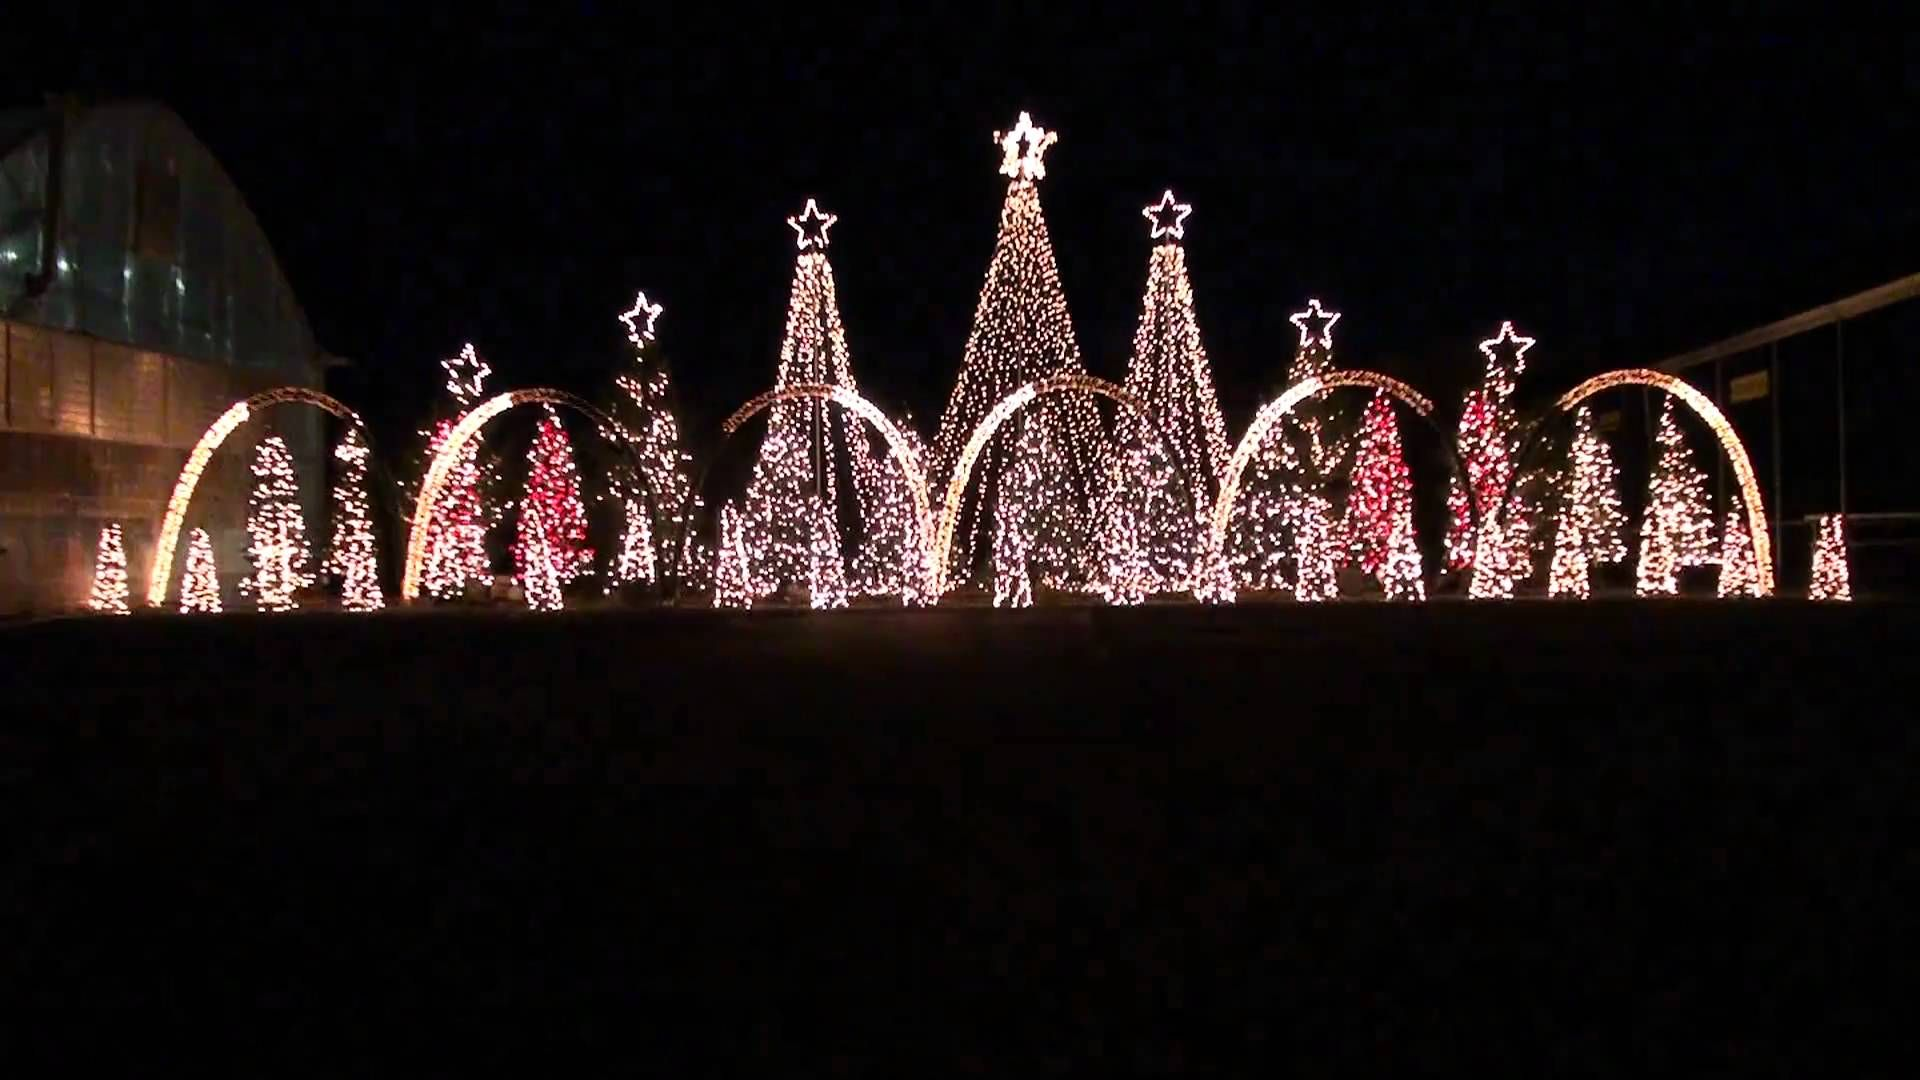 Amazing Grace Techno - Synchronized Christmas Light Show to Music ...